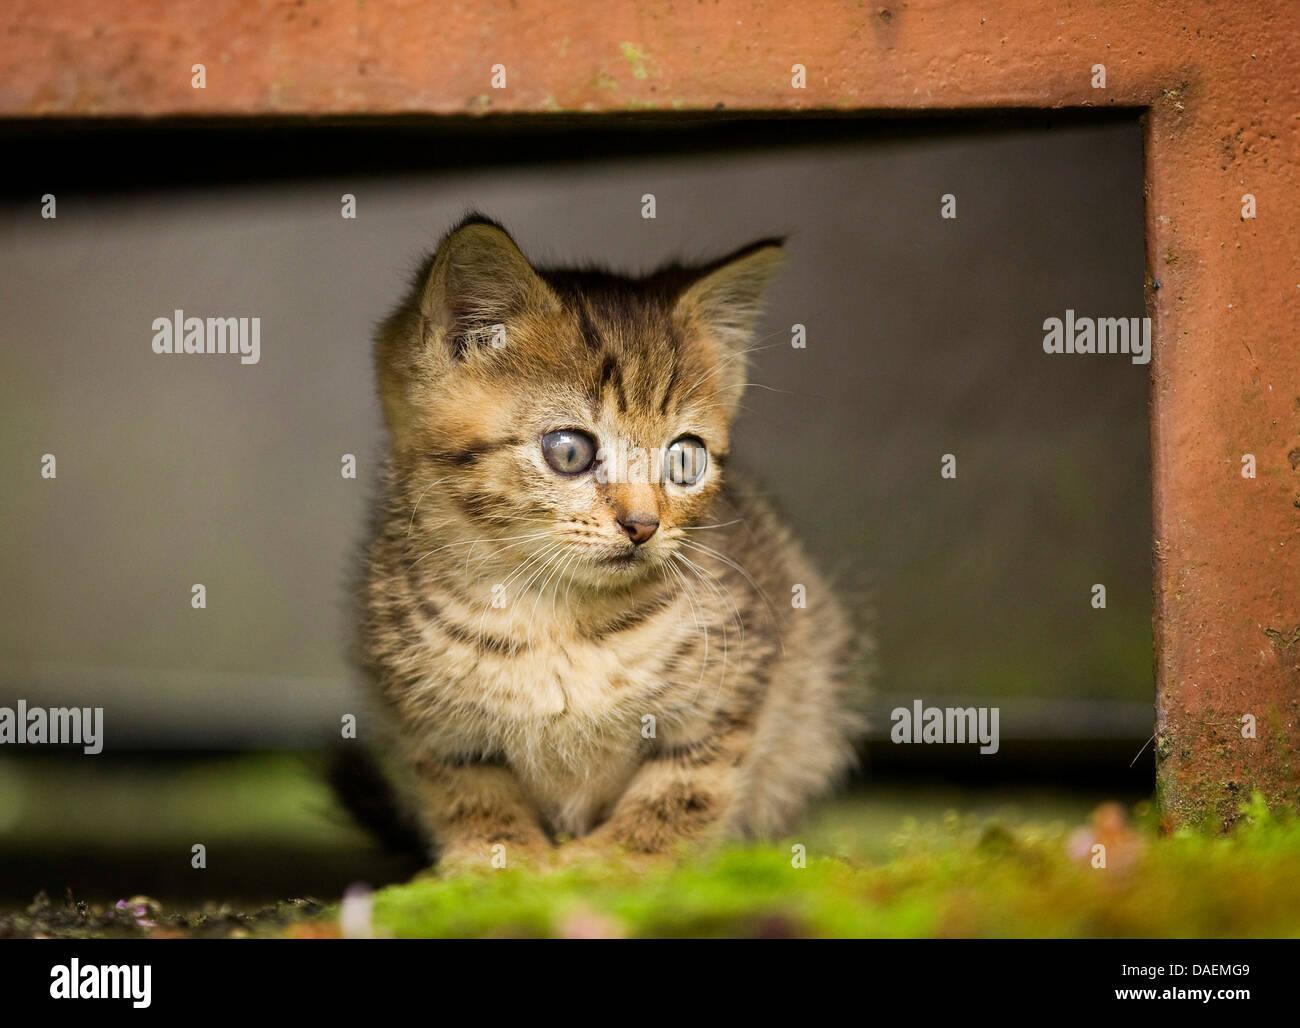 domestic cat, house cat (Felis silvestris f. catus), kitten sitting ...